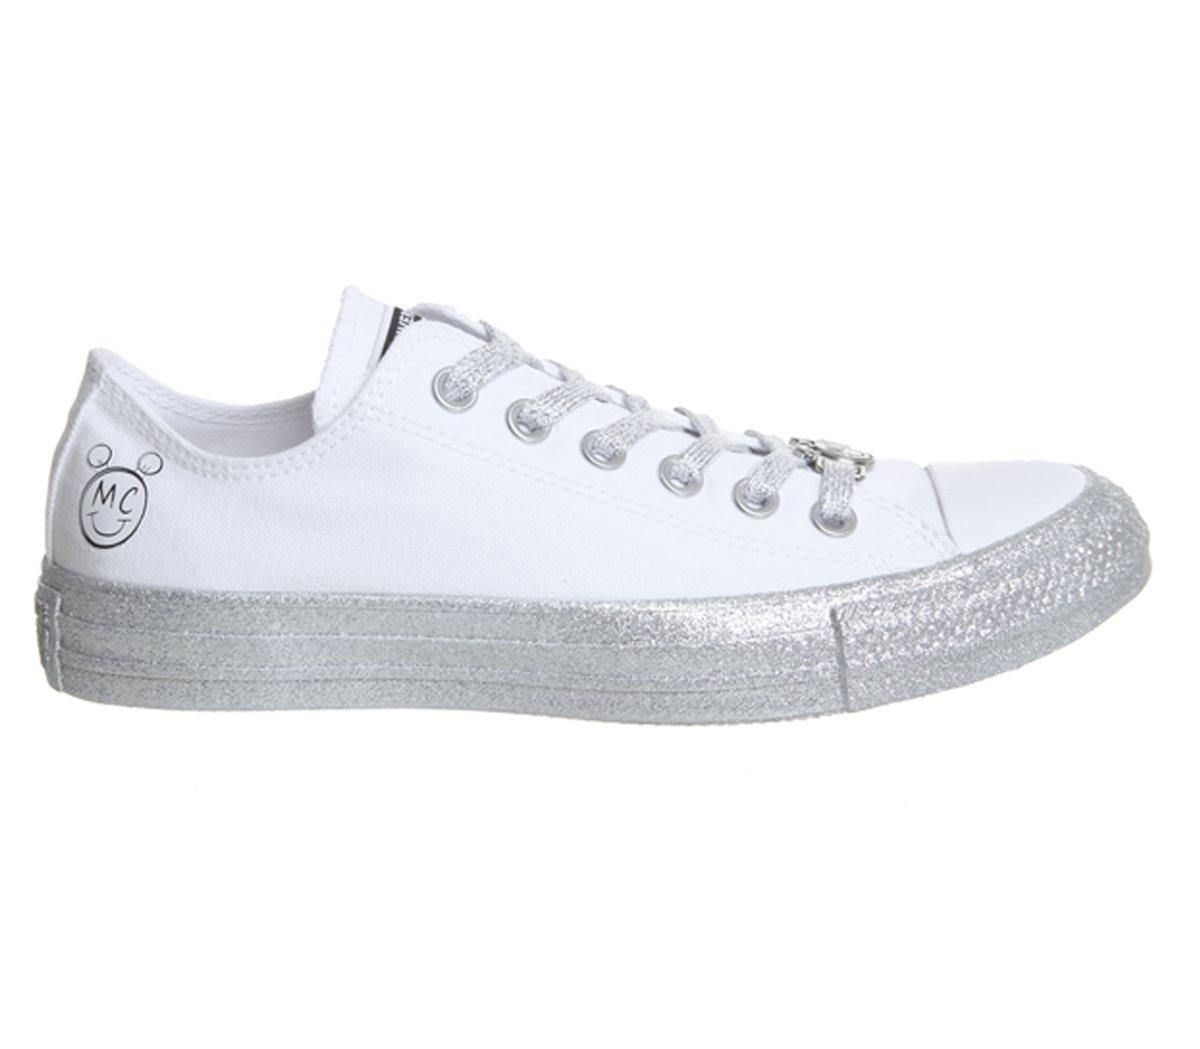 ... Converse Womens x Miley Cyrus Chuck Taylor All Star 6.5 Womens Lo  Sneaker B07CV4V2JM Mens ... a3ac1ae24